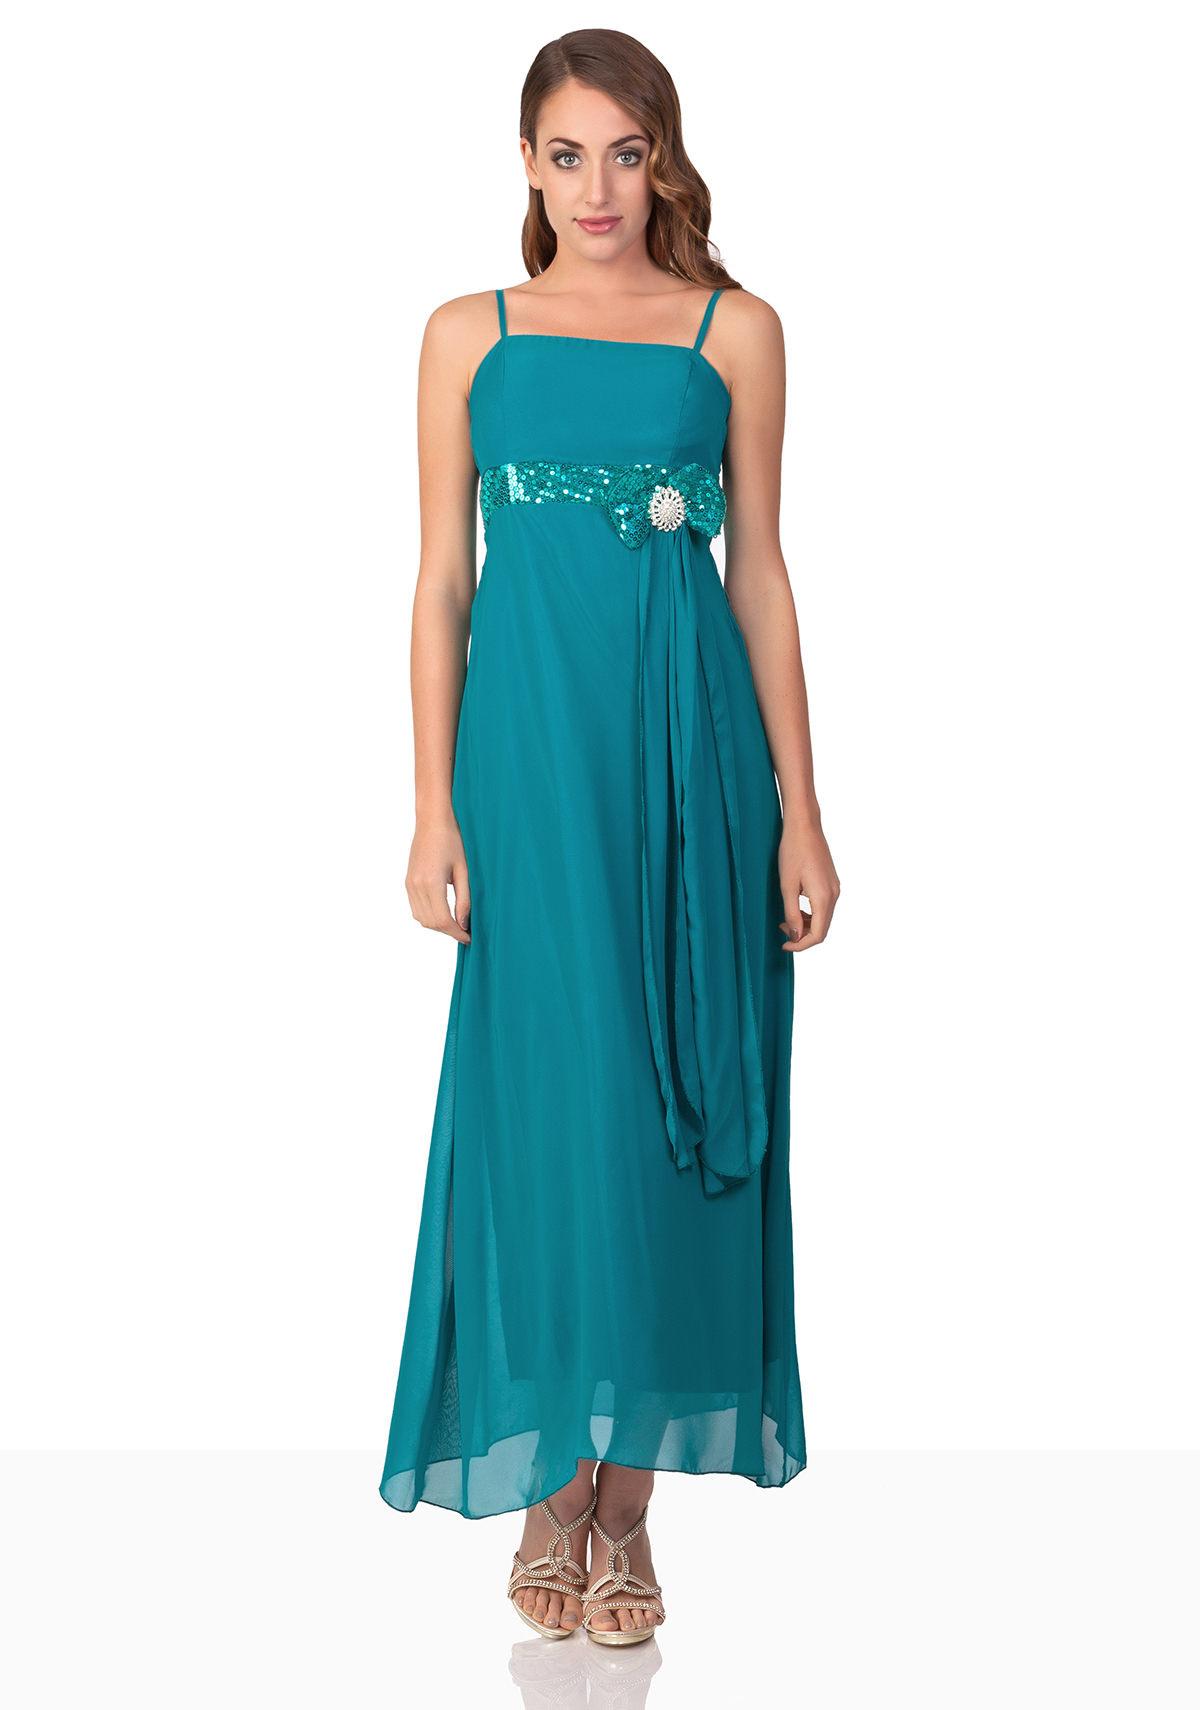 15 Luxurius Türkises Abendkleid ÄrmelFormal Großartig Türkises Abendkleid Vertrieb